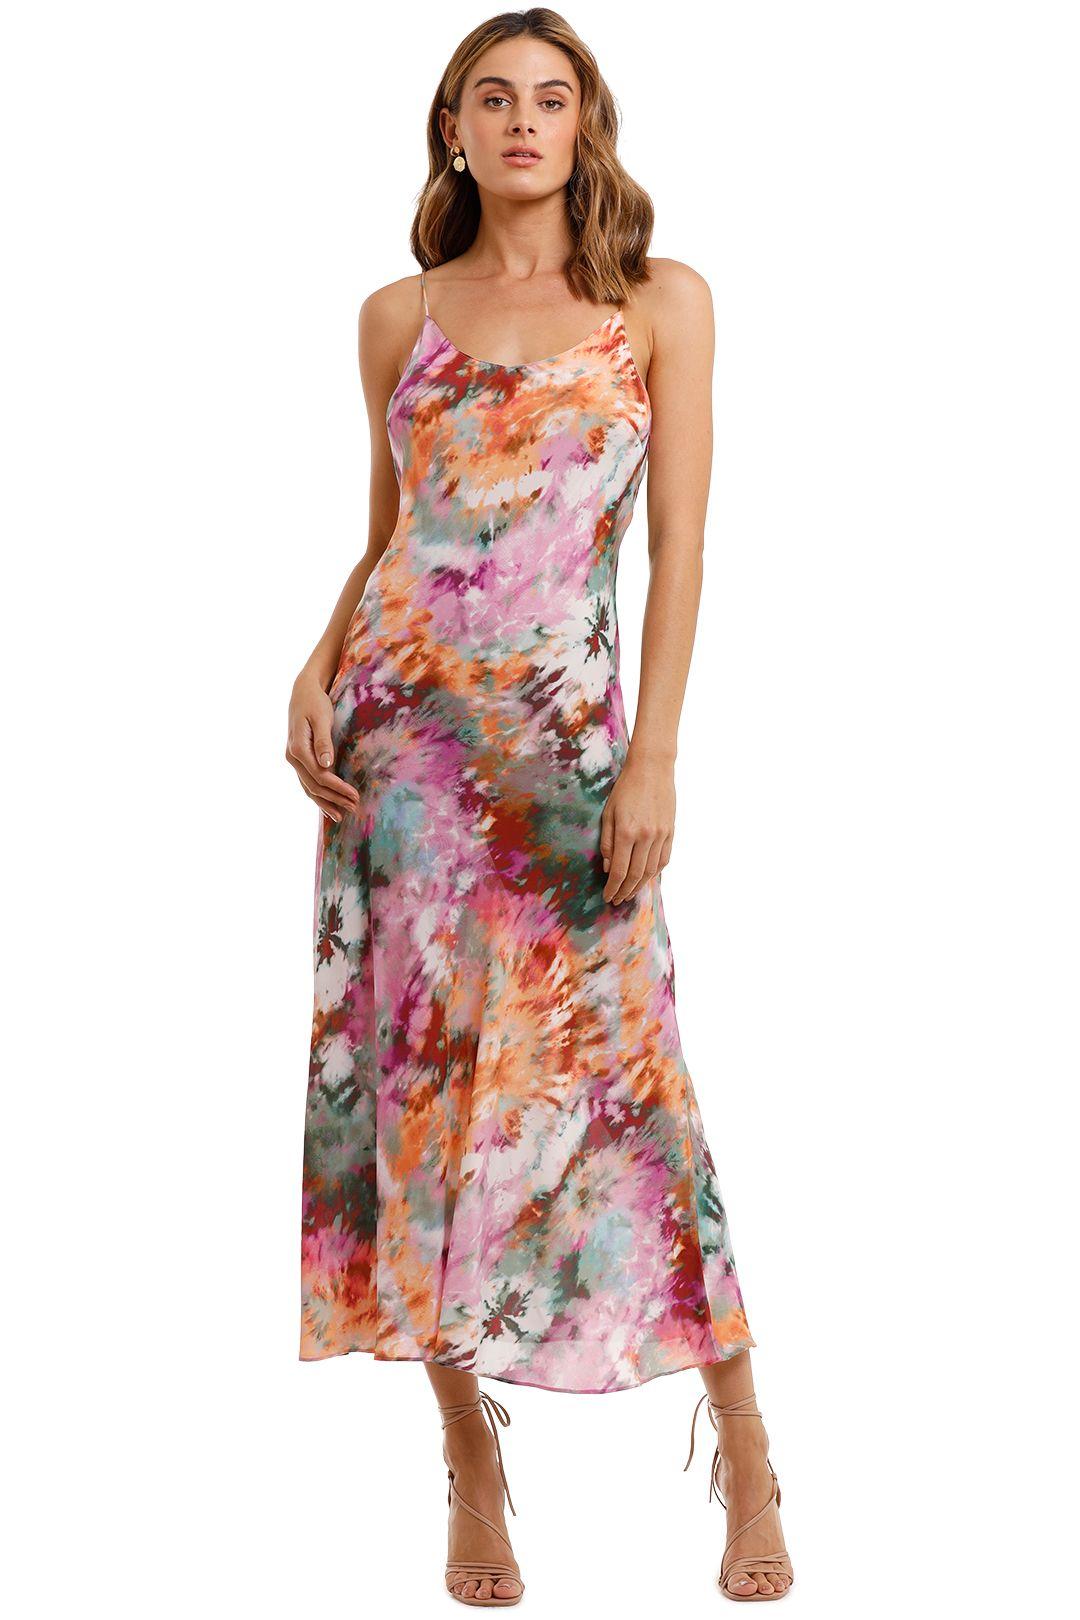 Kachel Demi Dress sleeveless